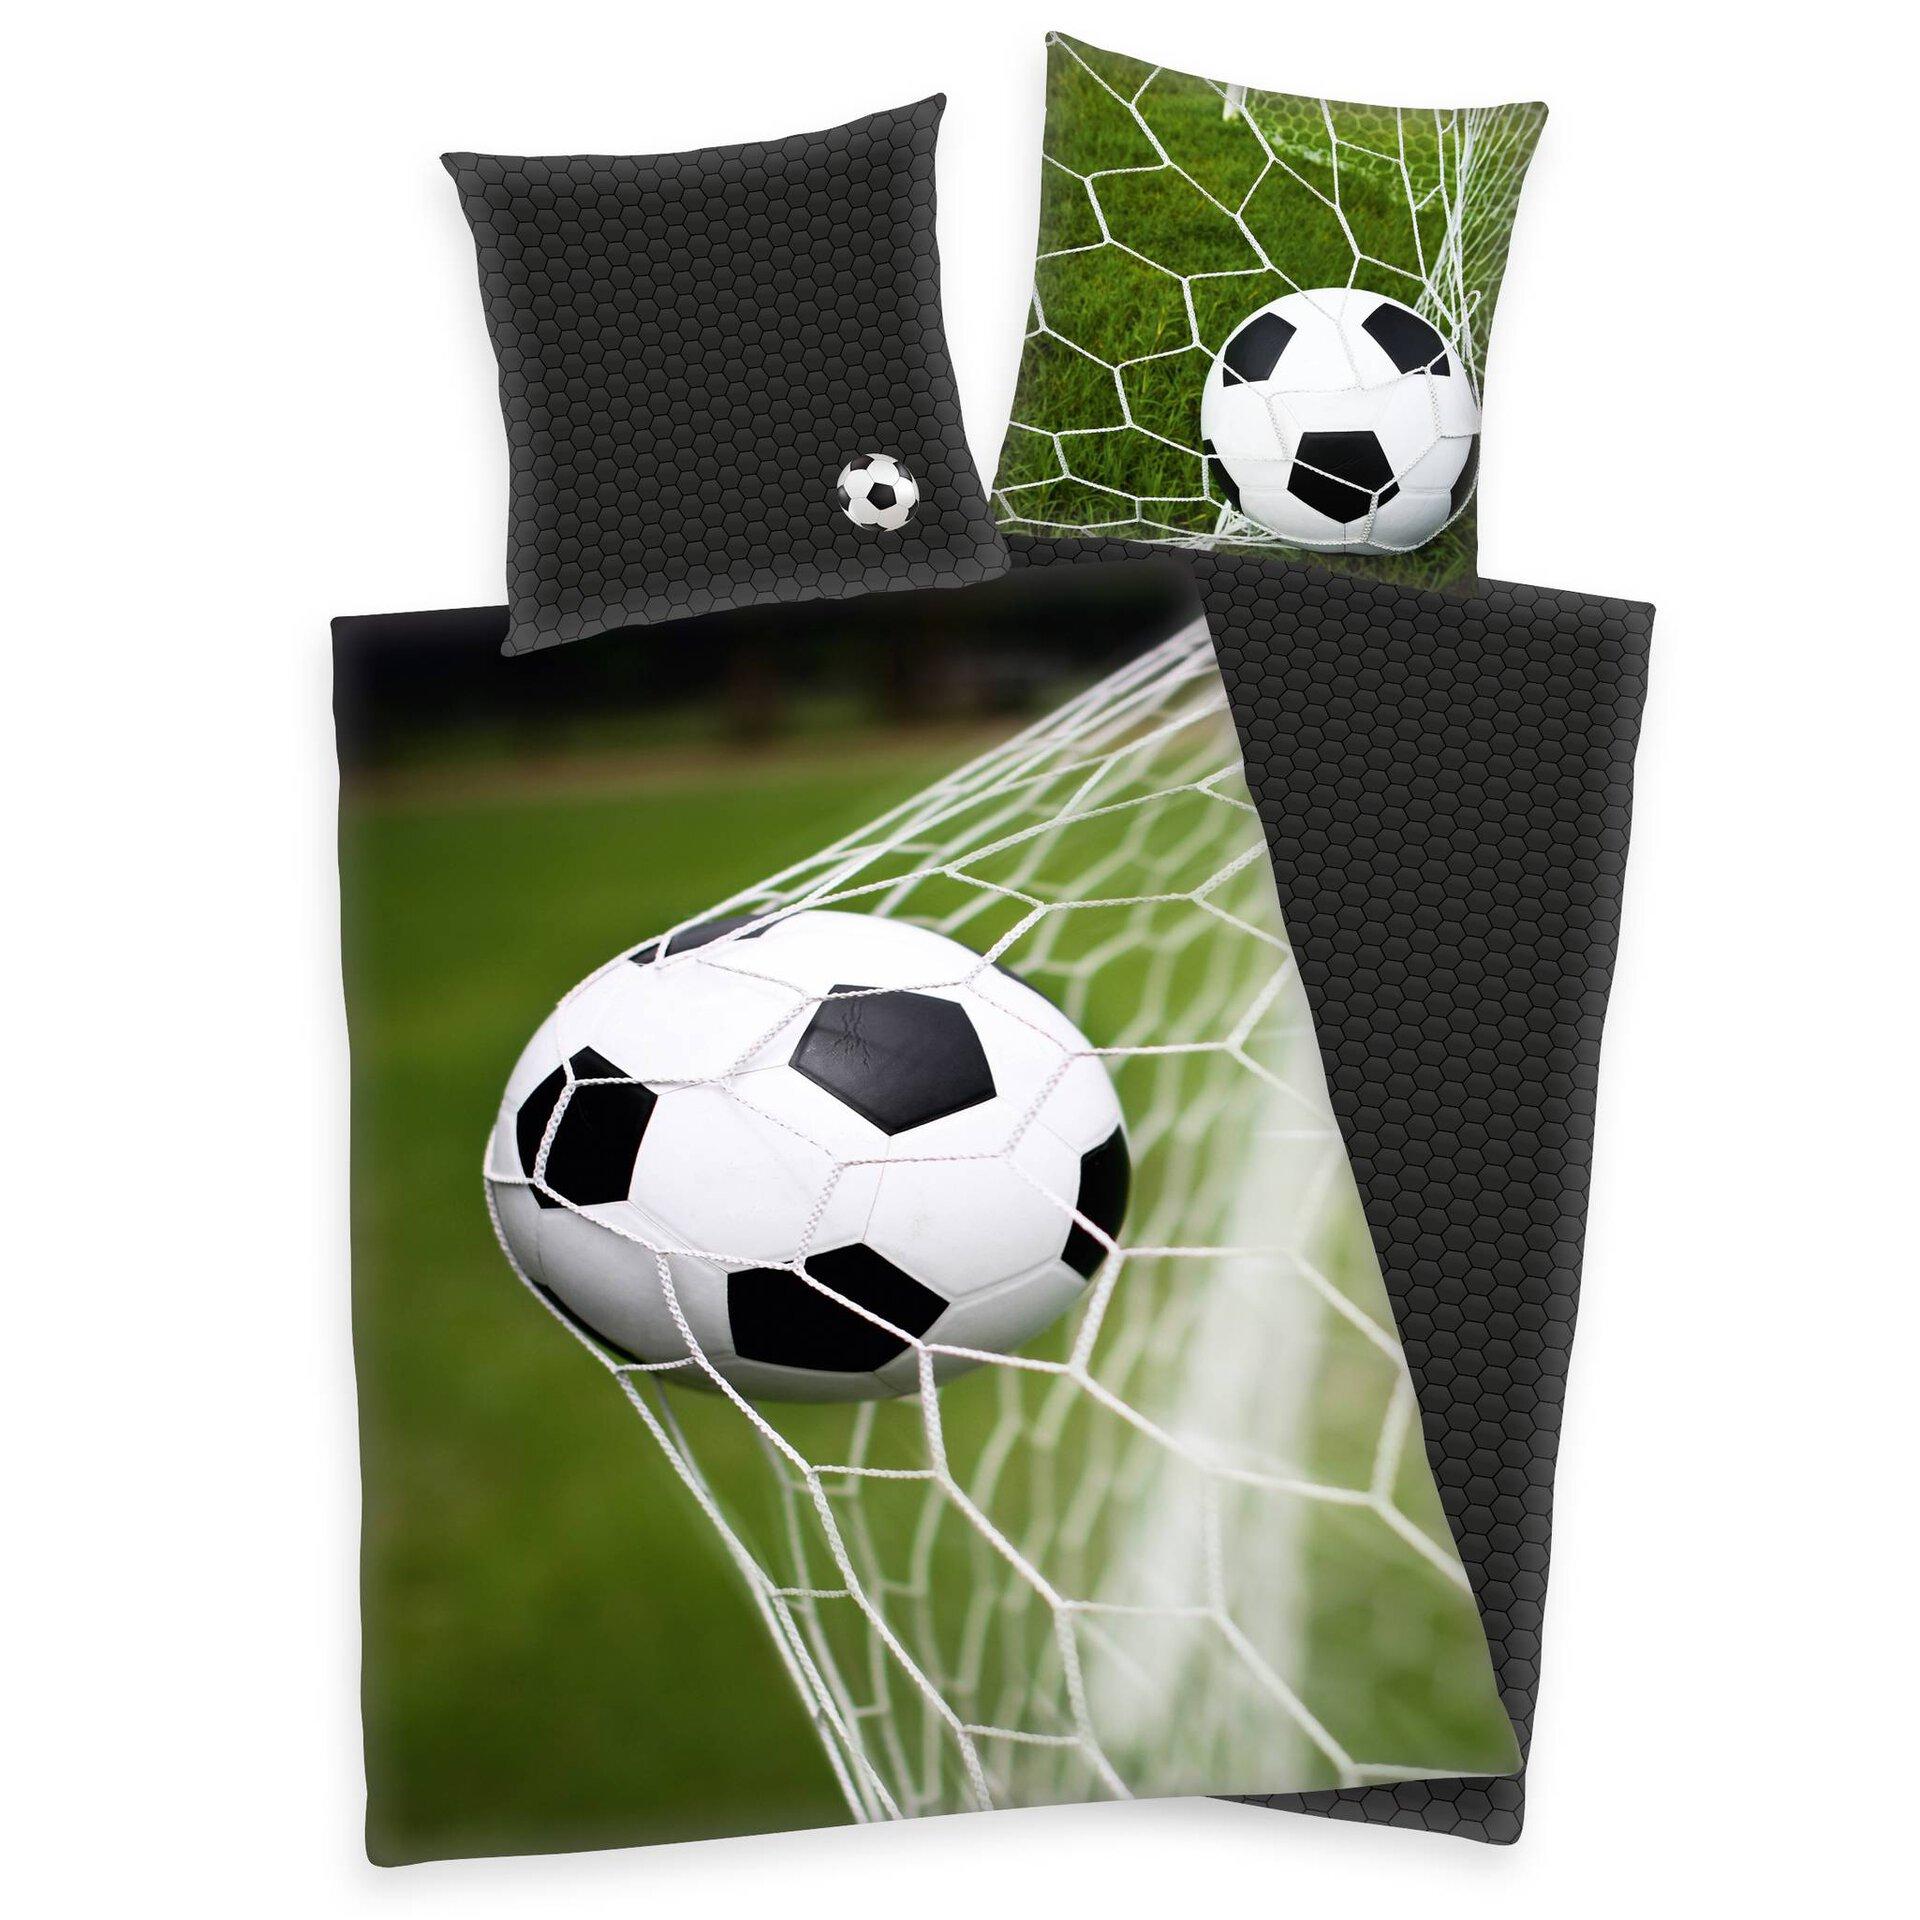 Kinderbettwäsche YoungC. Fußball Klaus Herding Textil mehrfarbig 135 x 200 cm